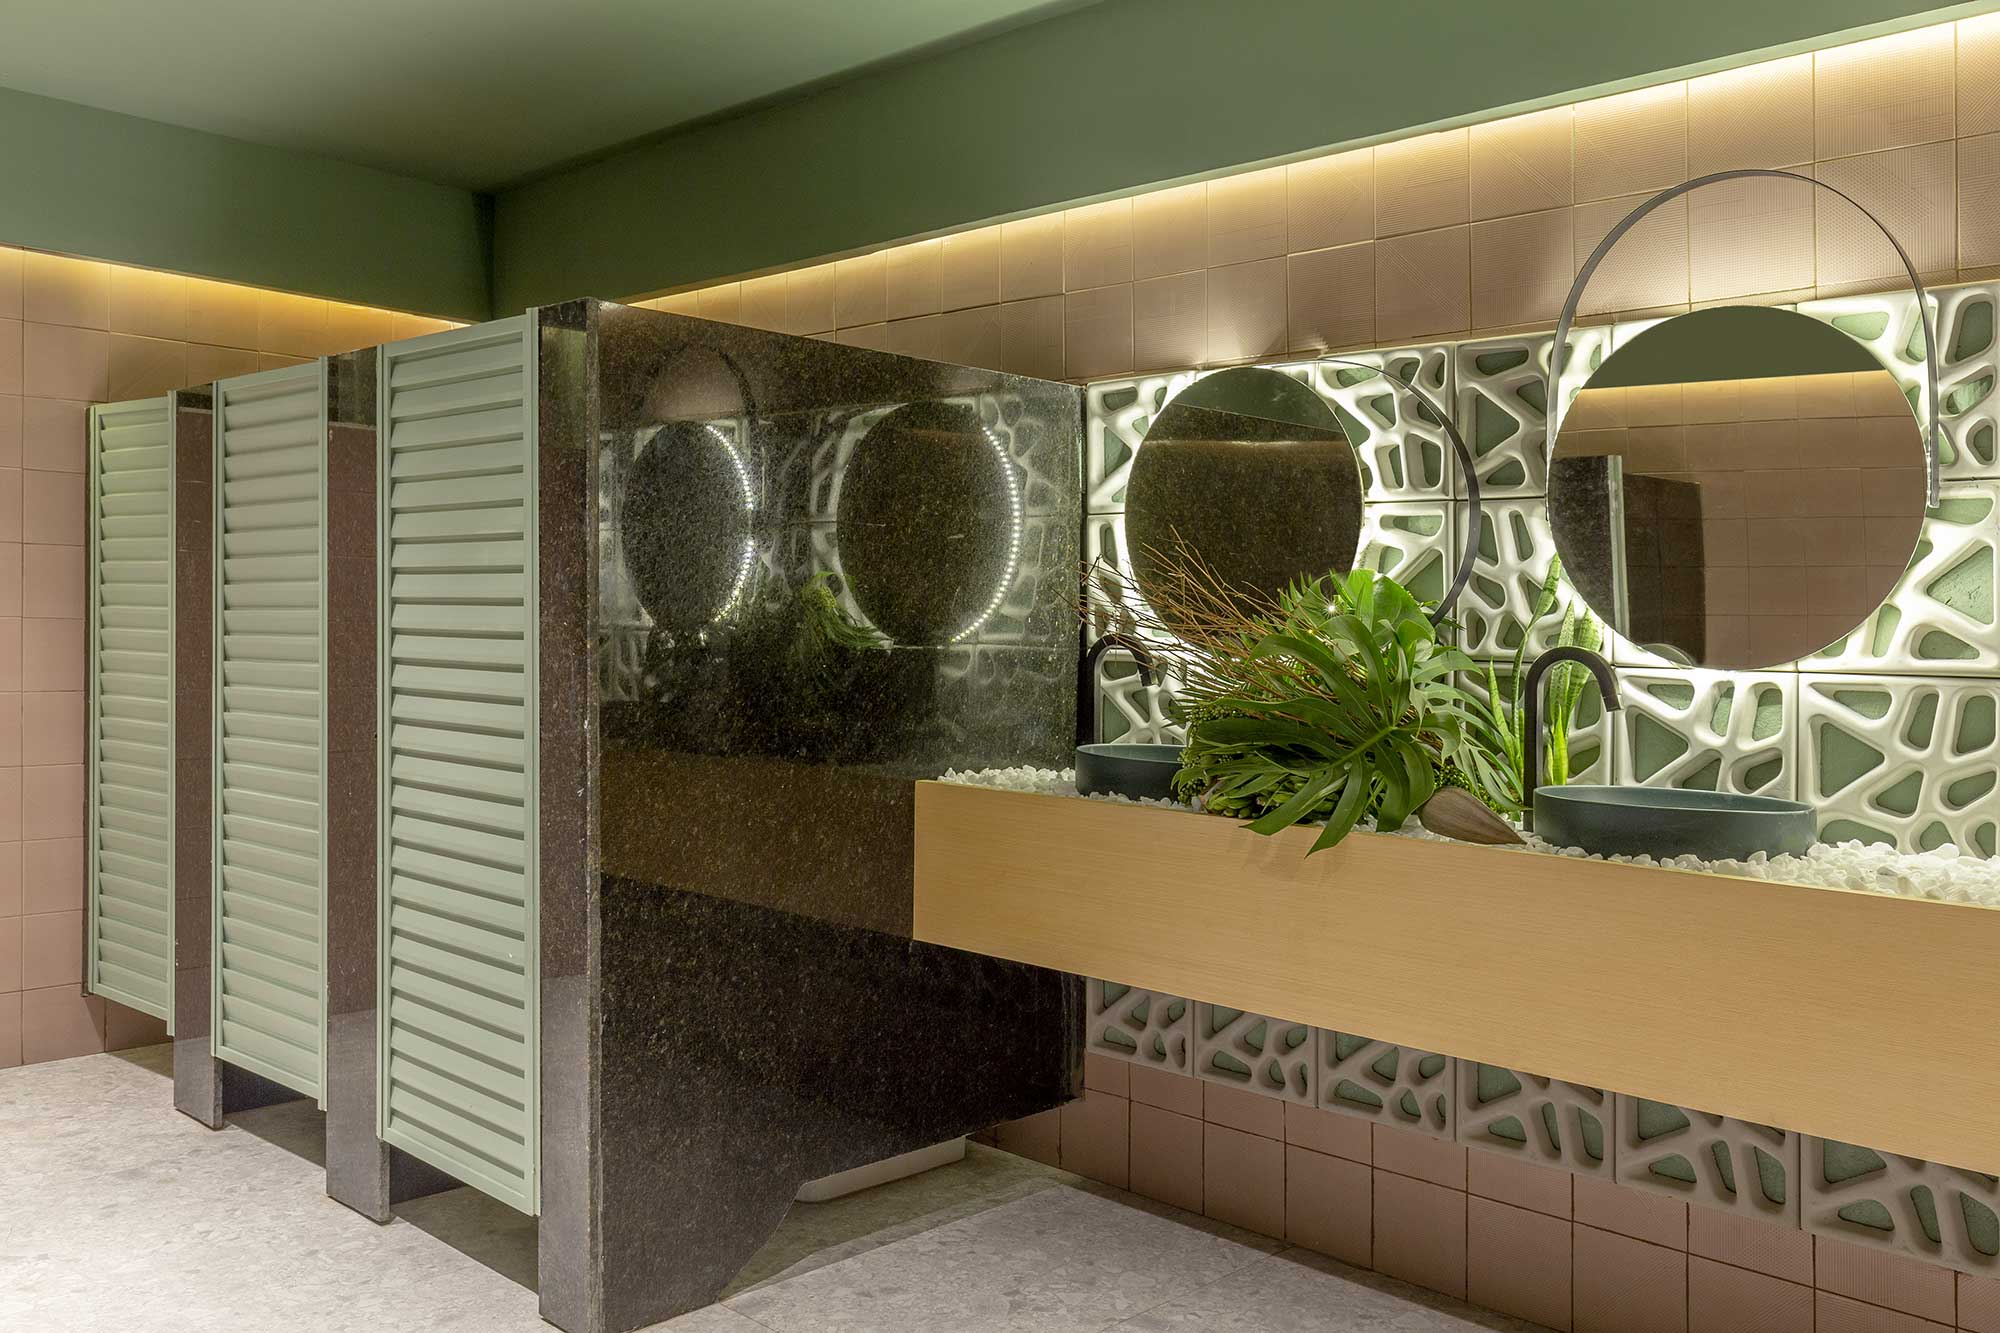 Paulo-Costa-Arquitetura-Banheiro-Publico-Feminino--Janelas-Casacor-Tocantins-Foto-Edgar-Cesar